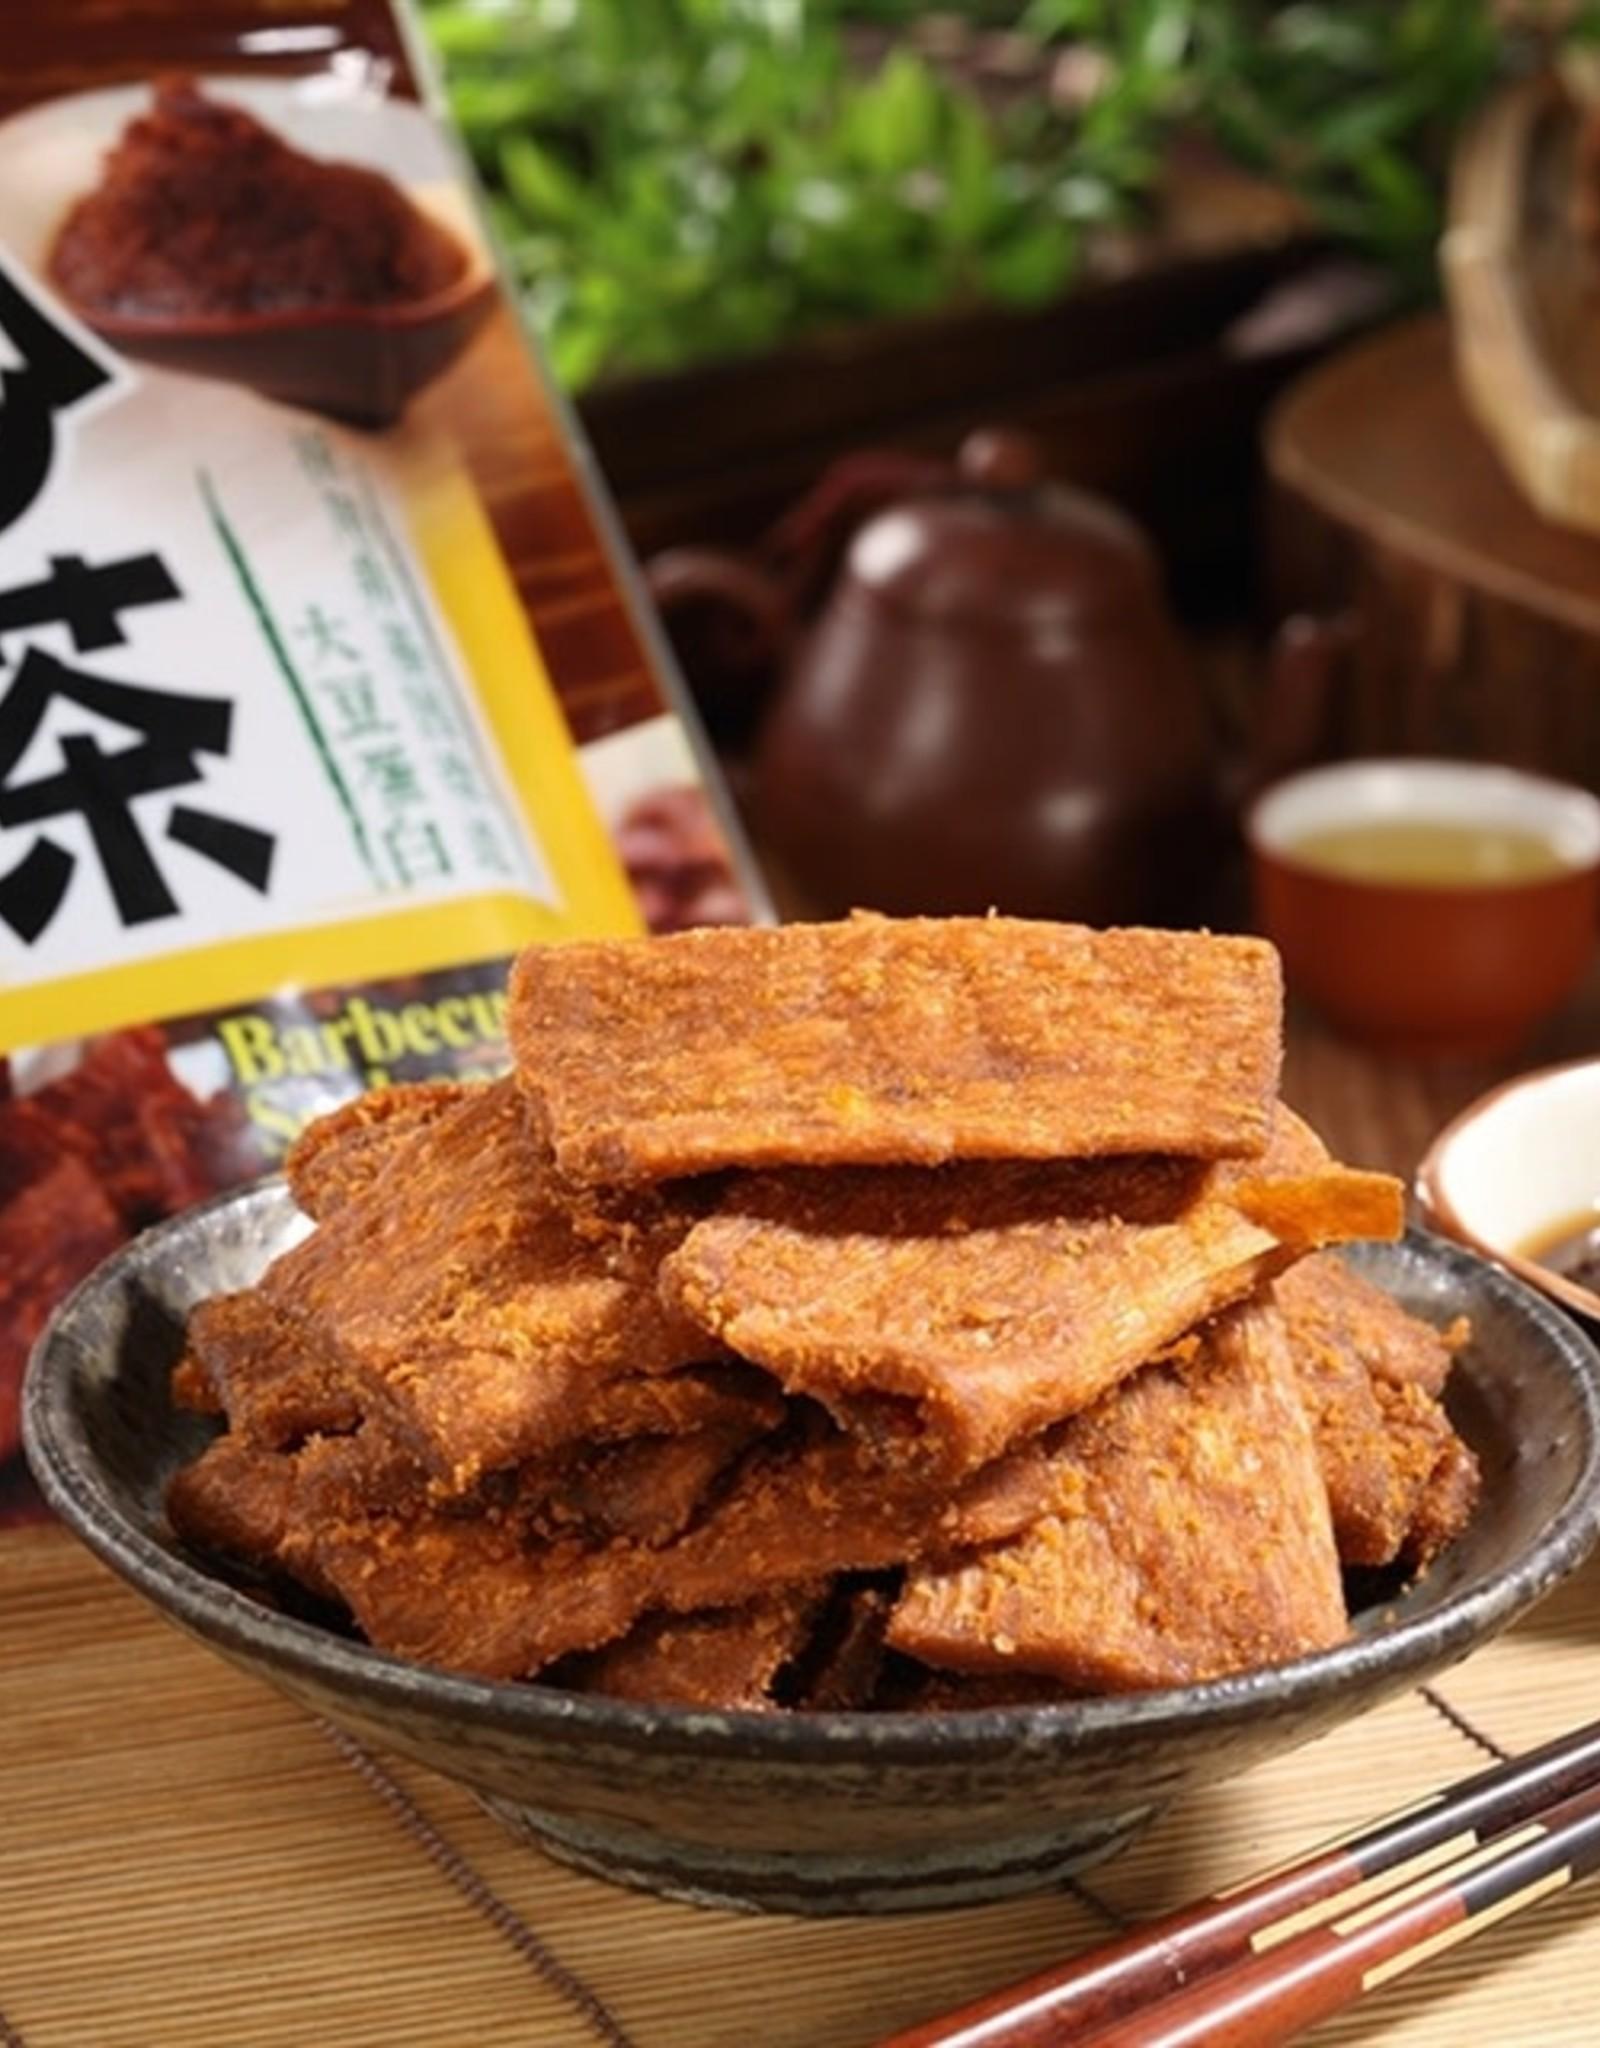 Fu Kuei Hsiang * 富貴香 (FKH) Vegan BBQ Sauce Soybean Slice*(富貴香) 沙茶燒肉干